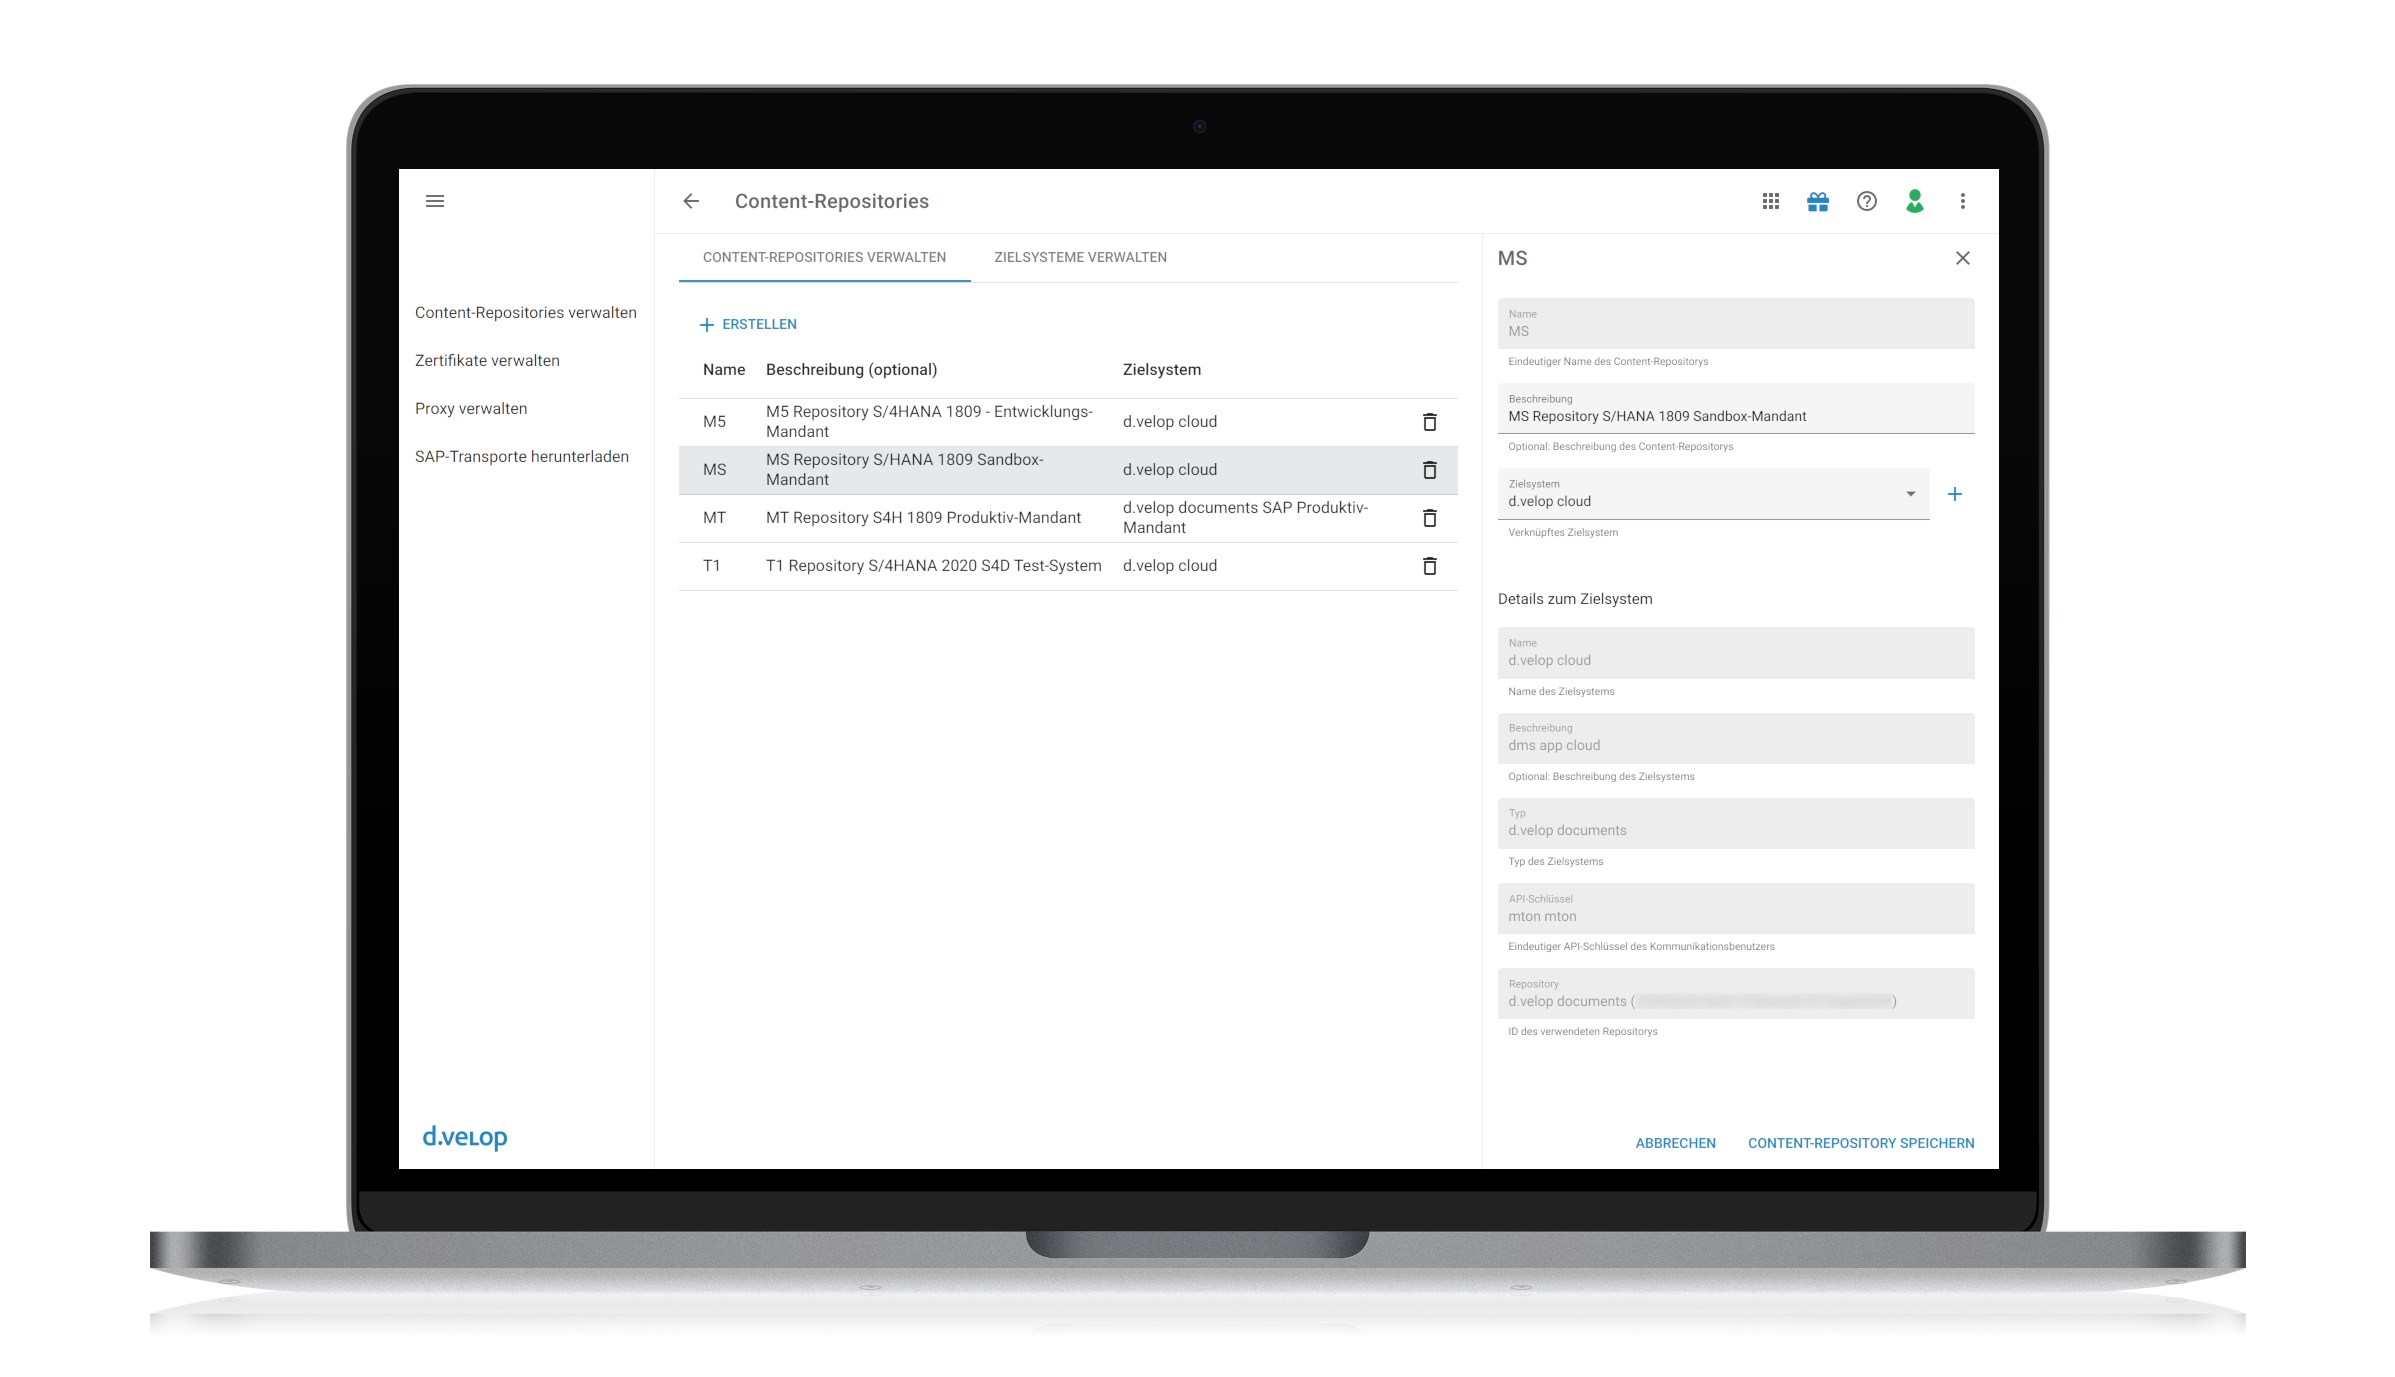 d.velop archivelink for SAP Solutions